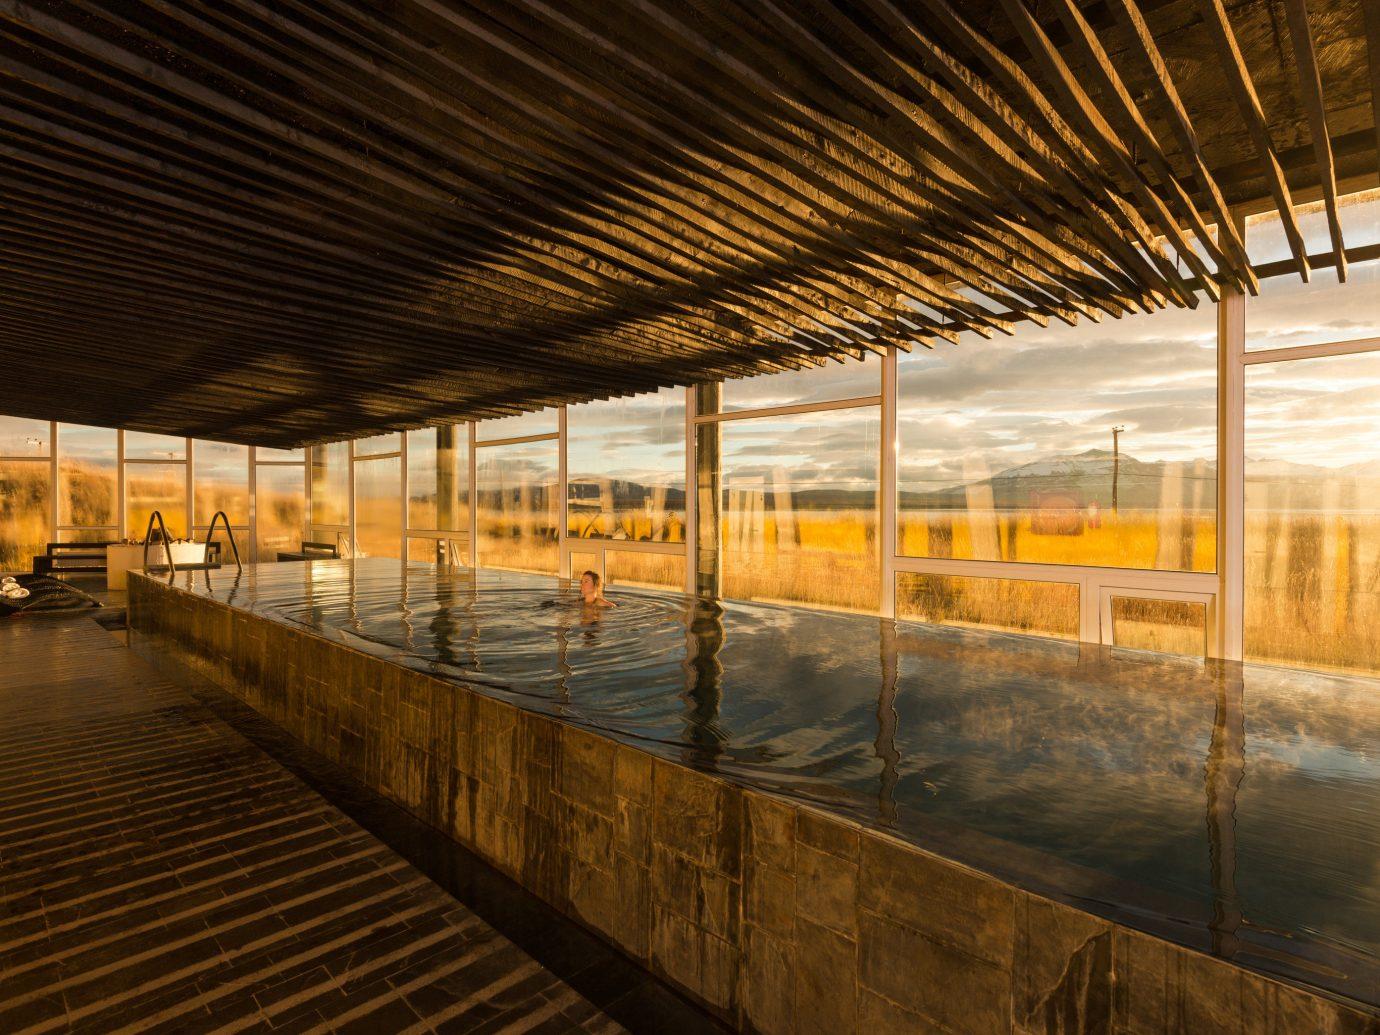 Hotels outdoor transport structure pier building Architecture wood interior design platform subway